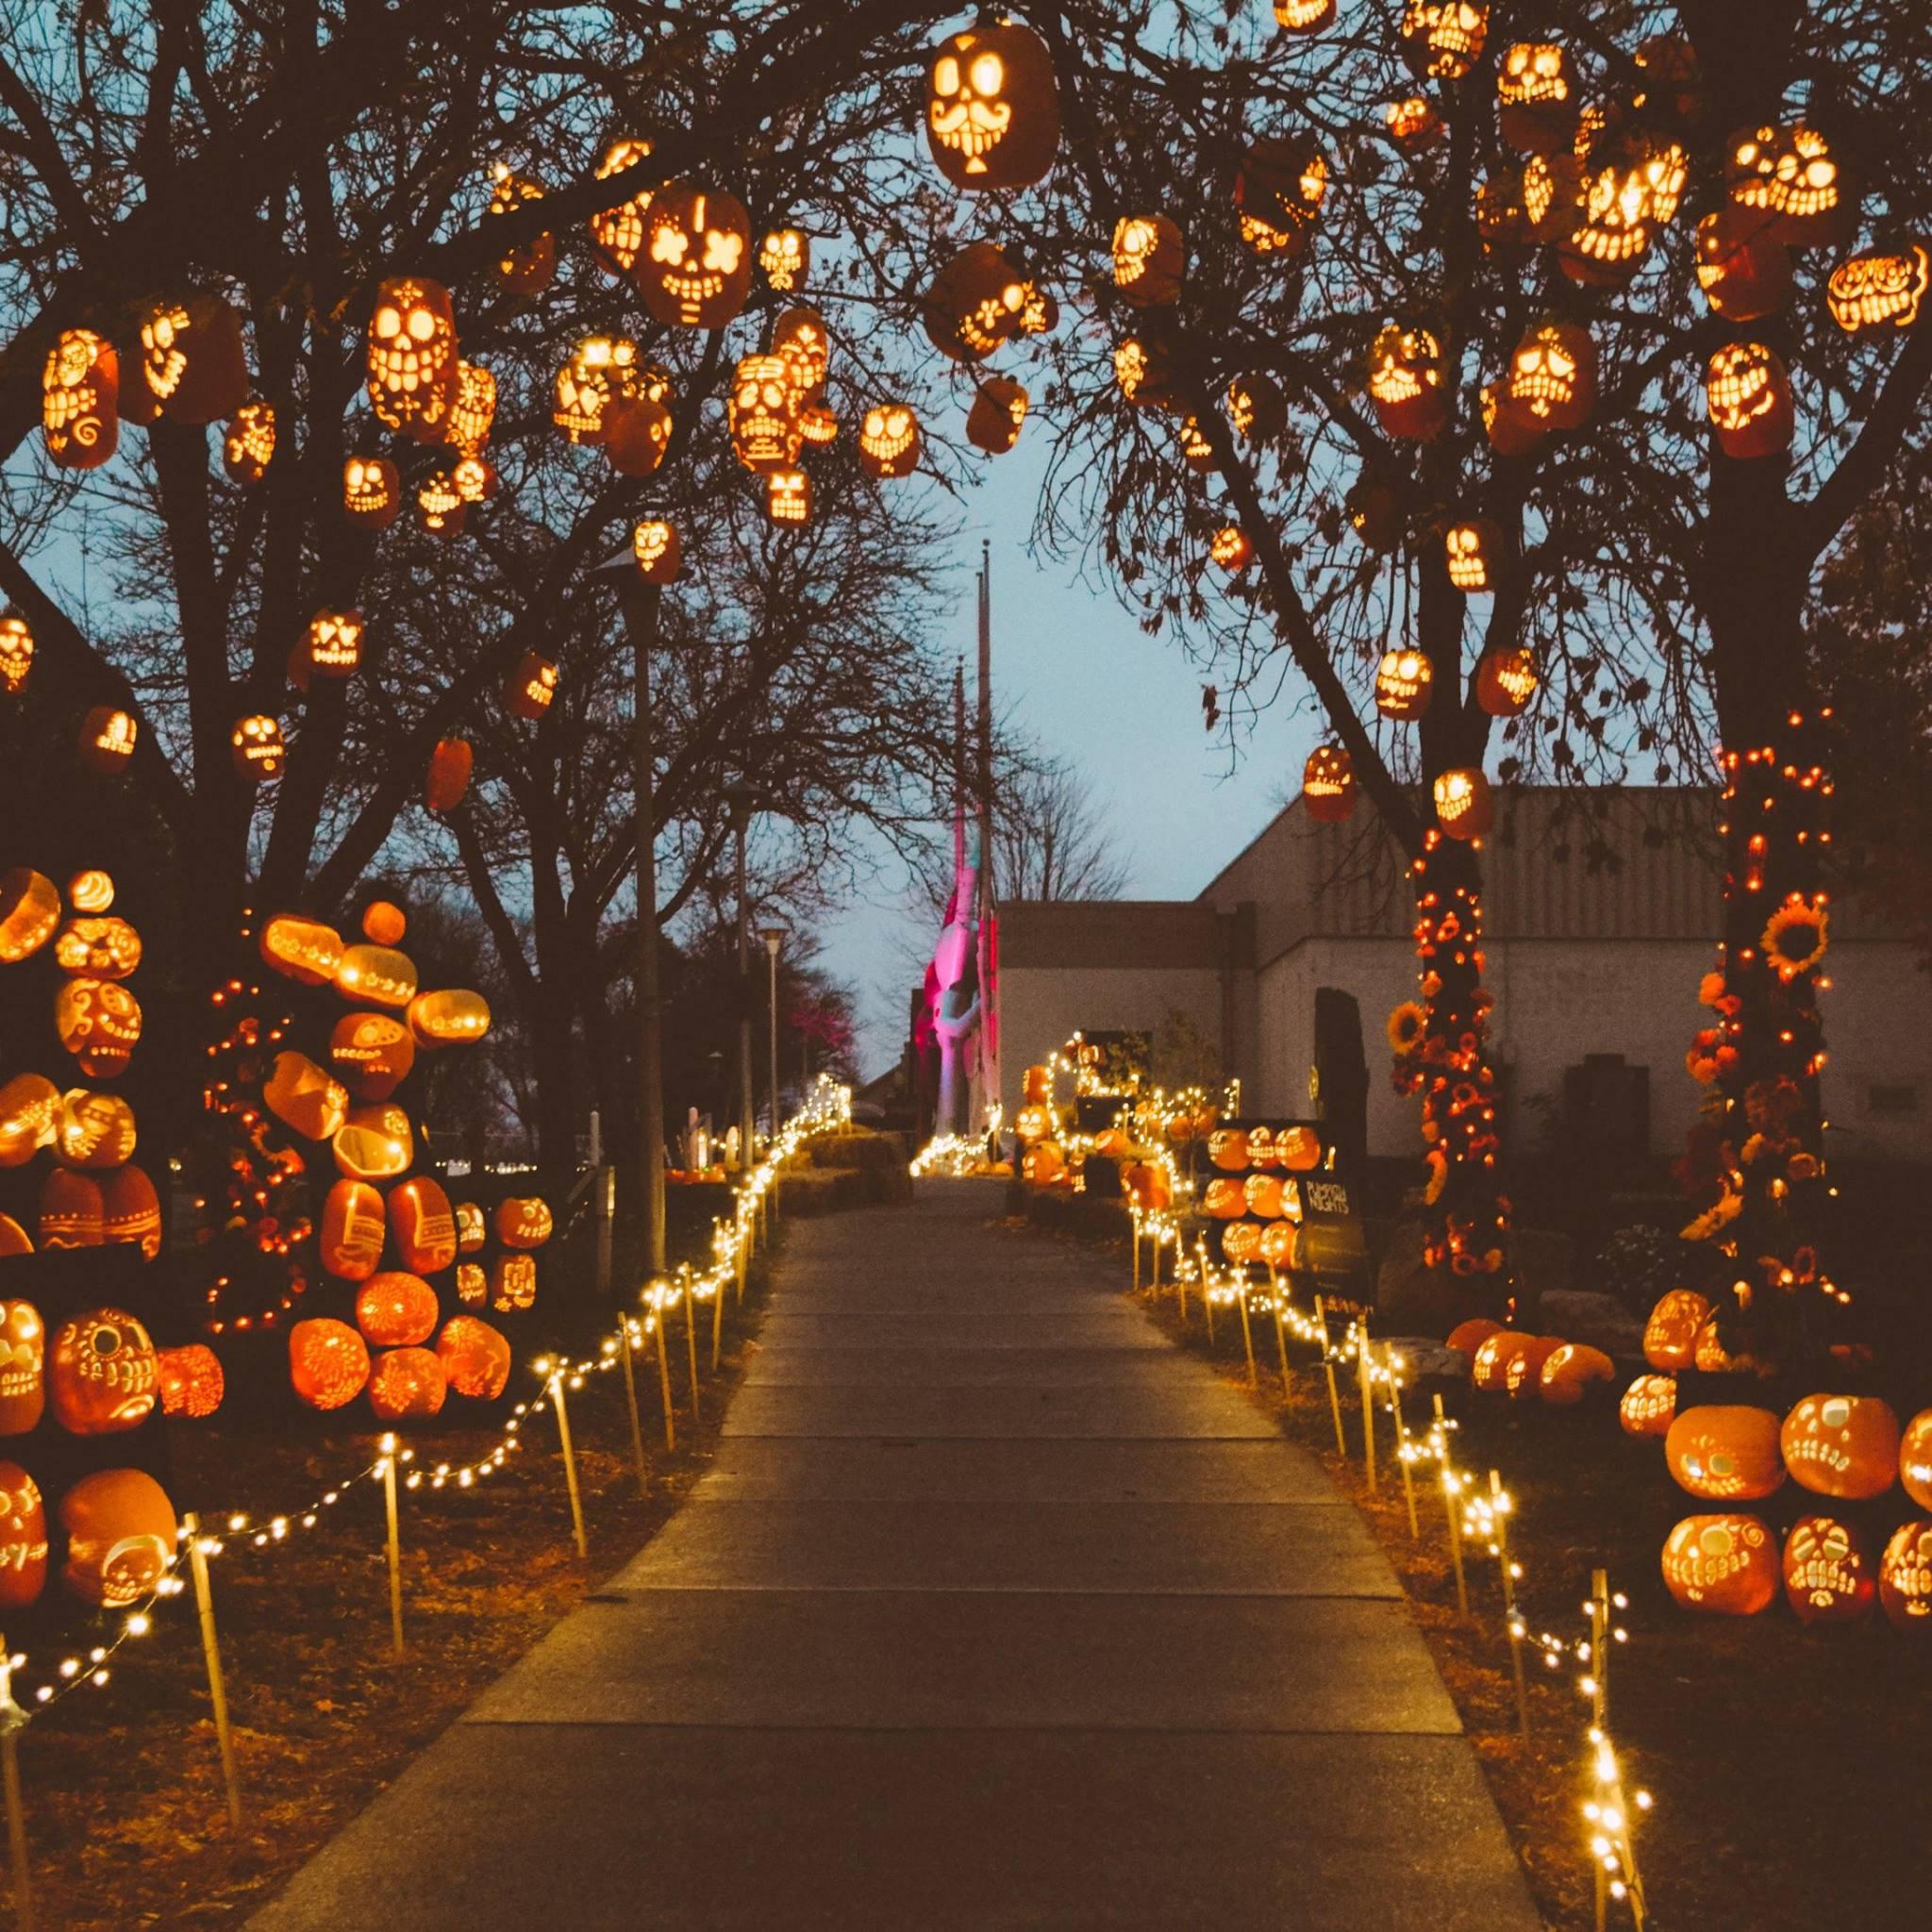 Florida Beach Fall Wallpaper Pumpkin Nights Is The Most Magical Halloween Event In